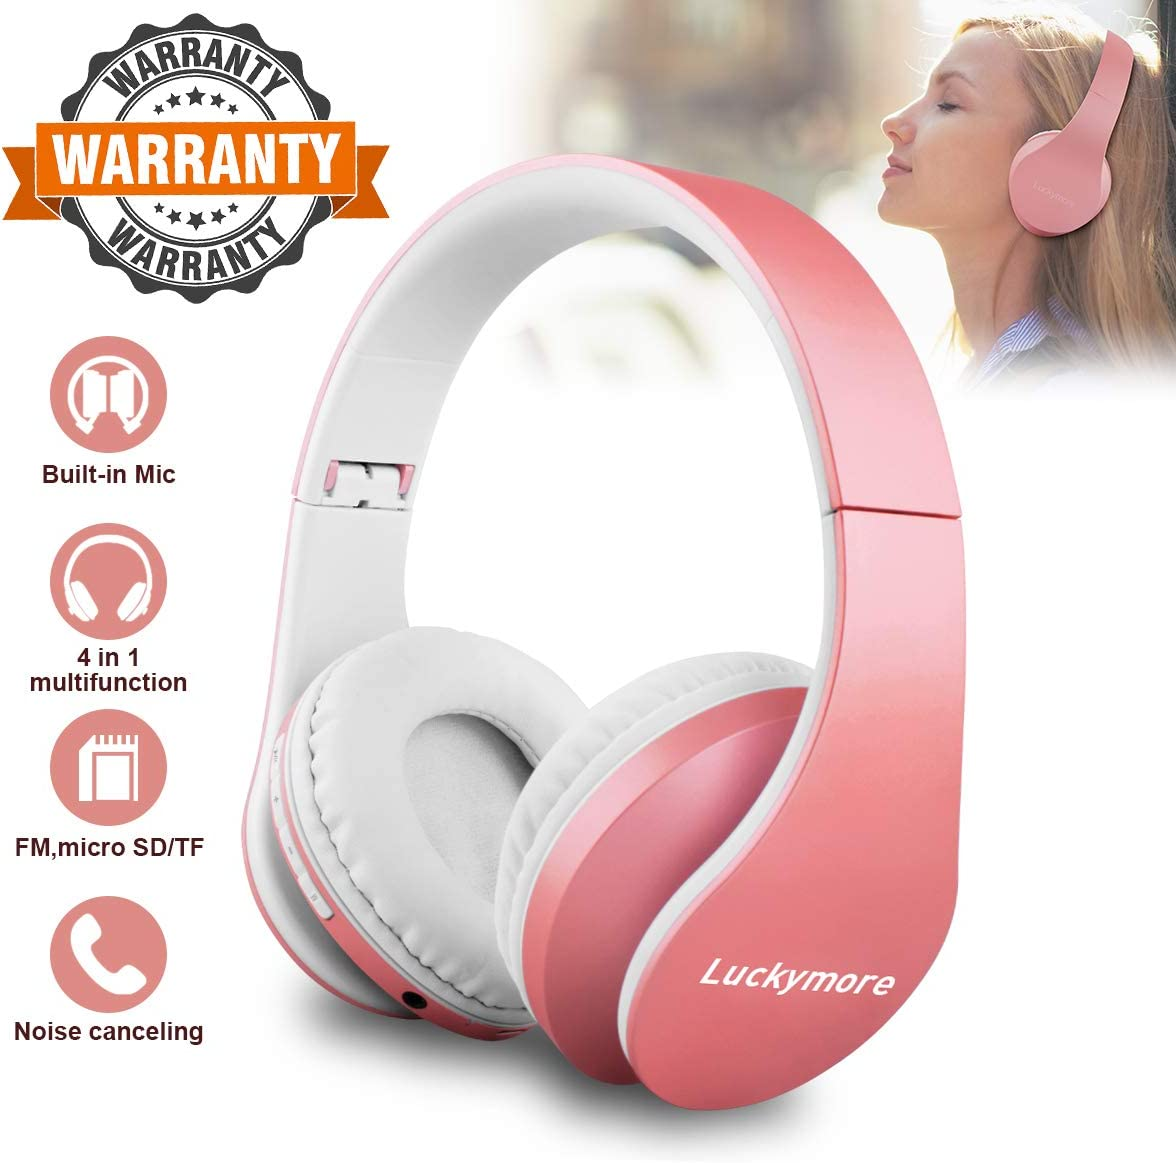 VERYCOZY Cascos Bluetooth Inalambricos,Over Ear Auriculares Bluetooth Plegable con Micrófono Auriculares Inalámbricos Bluetooth para Smartphone,Tablet, PC, TV: Amazon.es: Electrónica